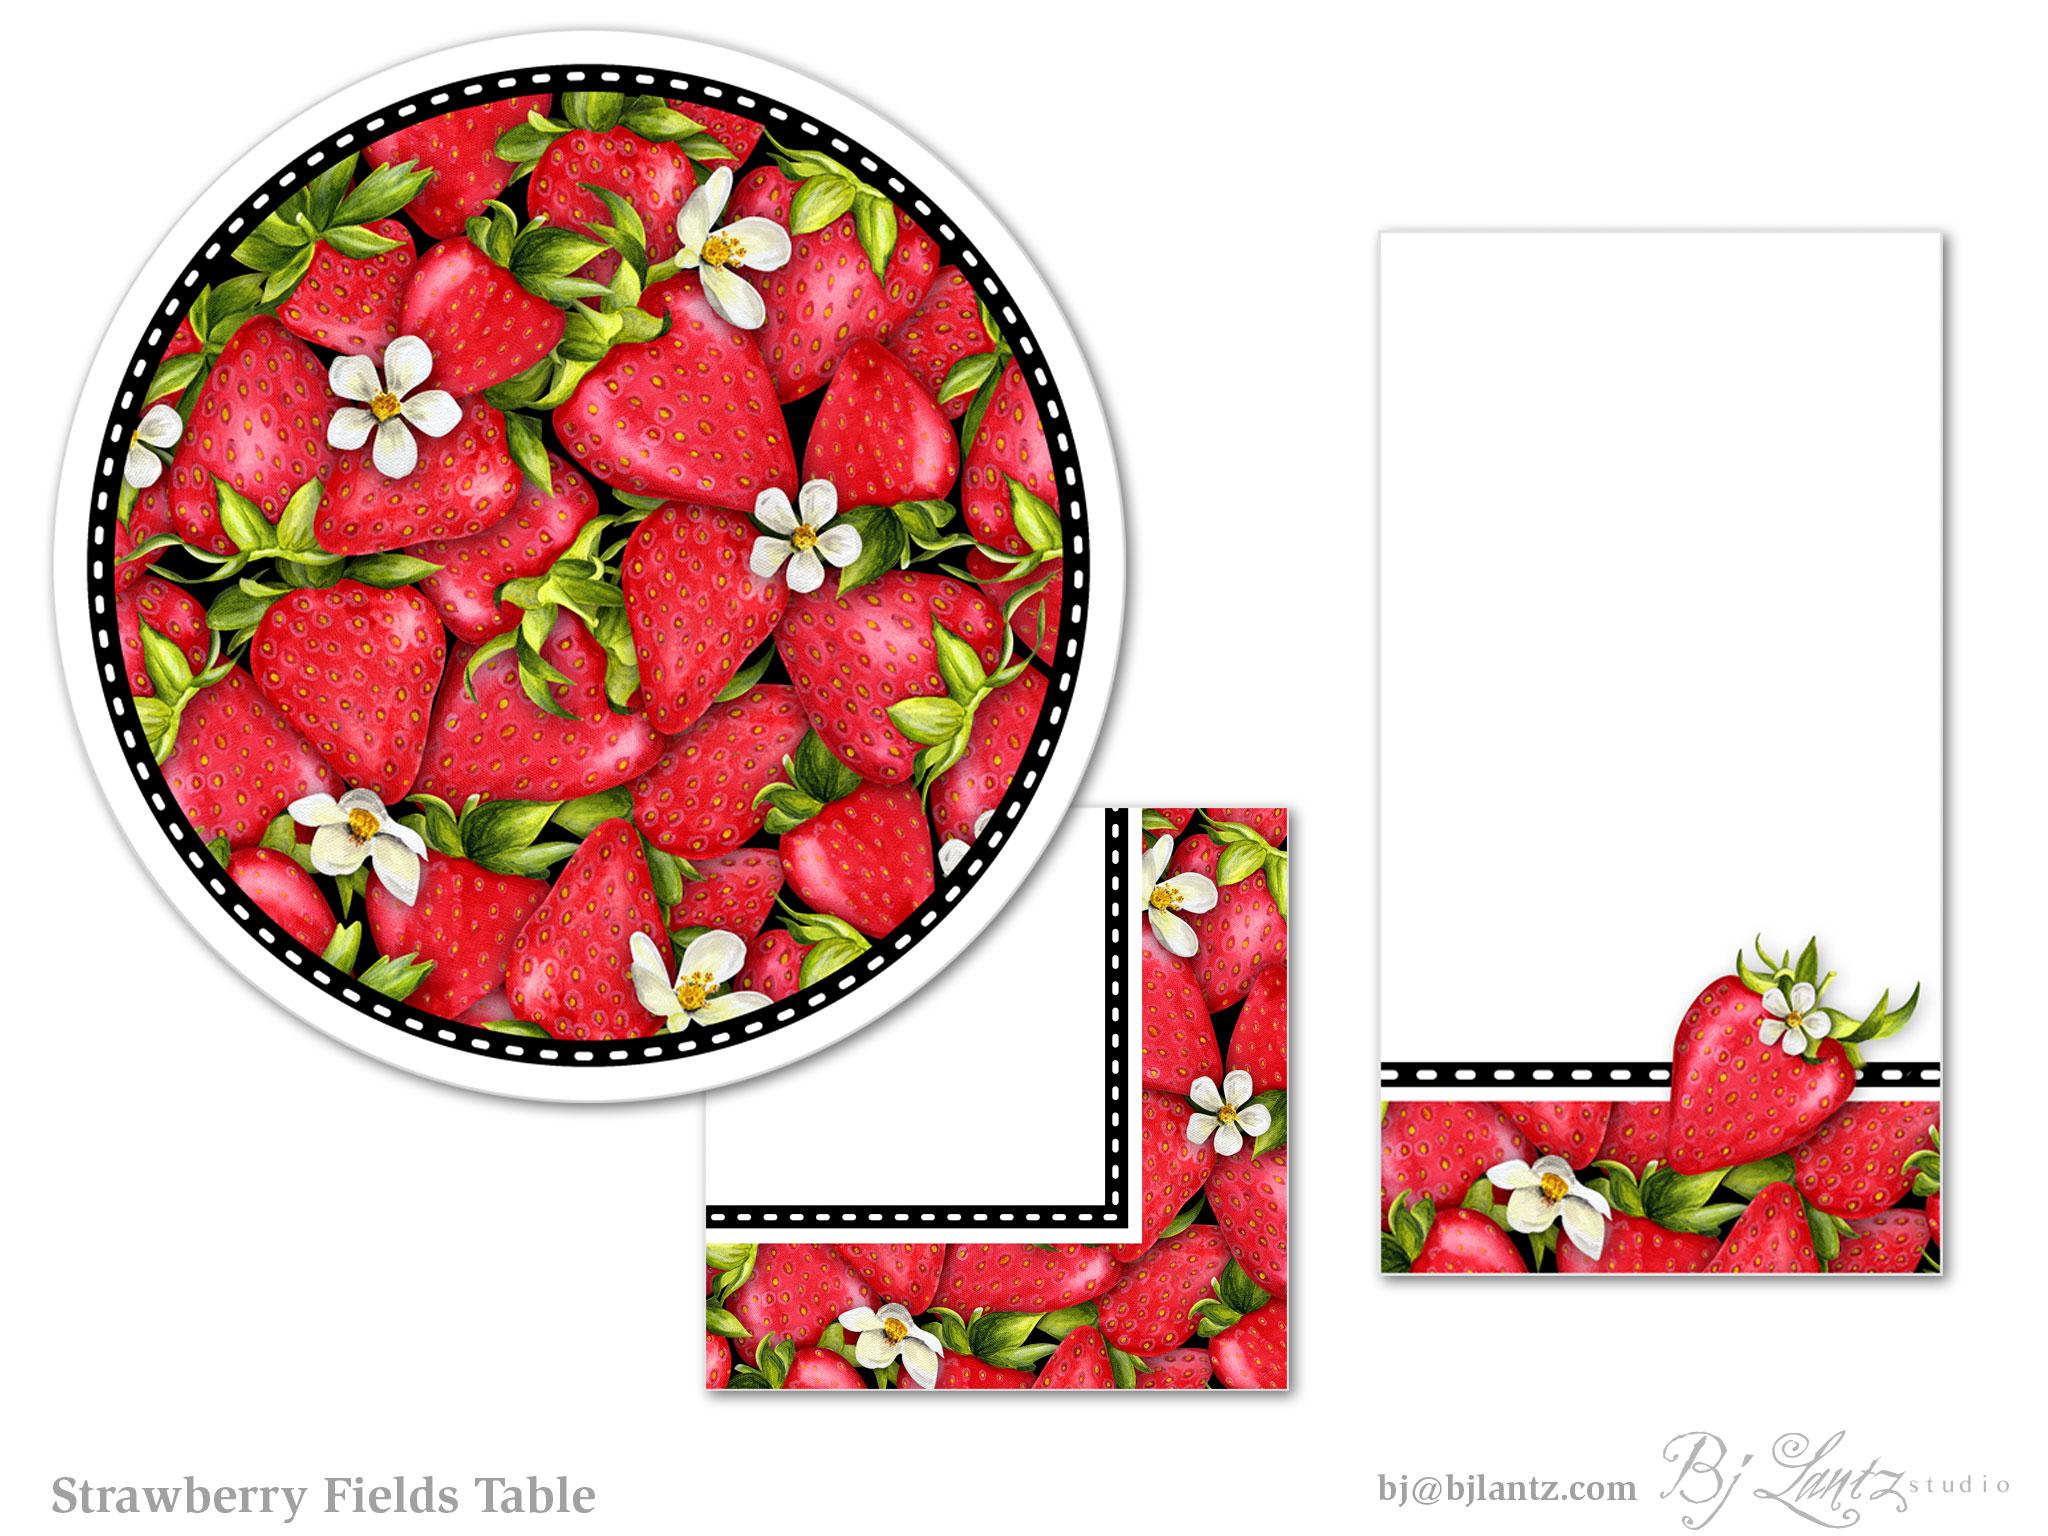 StrawberryFields-BJ-Lantz_1.jpg